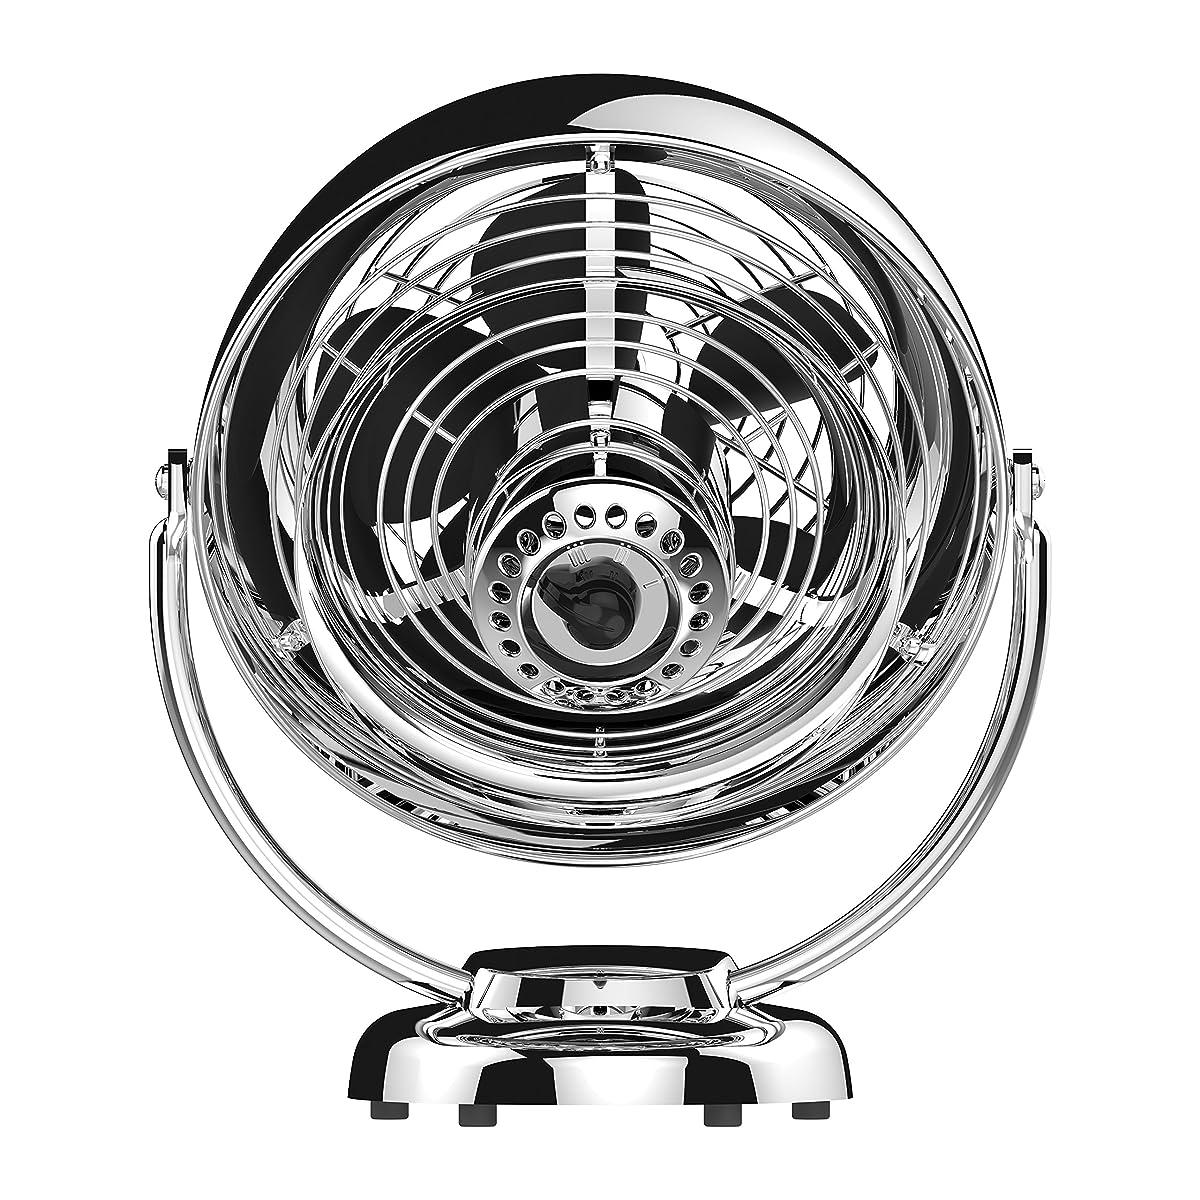 Vornado VFAN Vintage Whole Room Air Circulator, Chrome